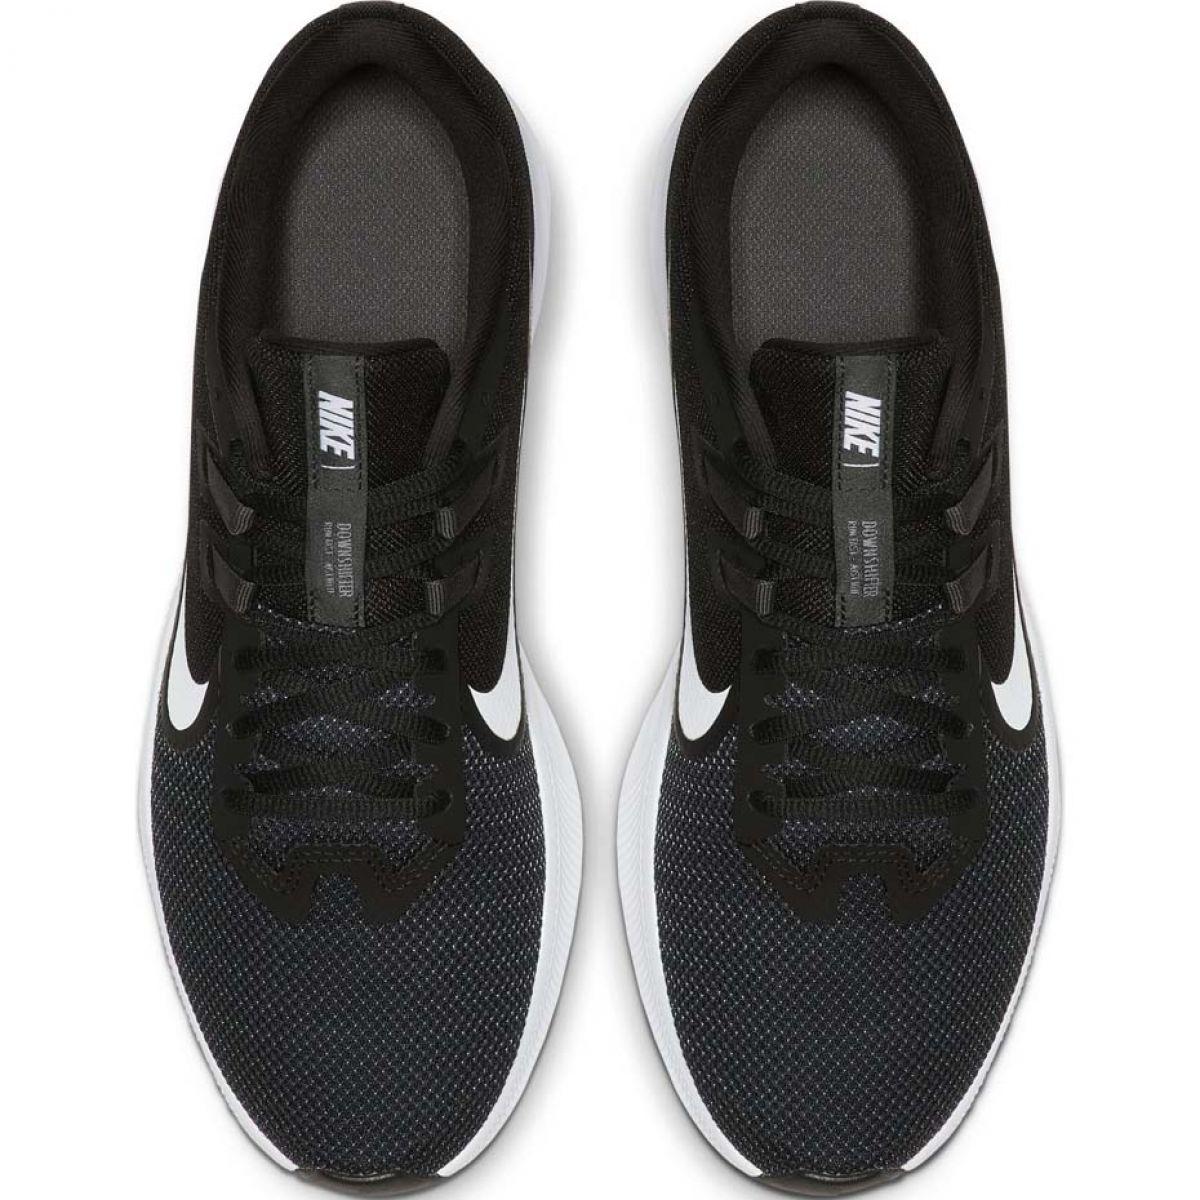 Tênis de corrida Nike Downshifter 9 M AQ7481 002 preto